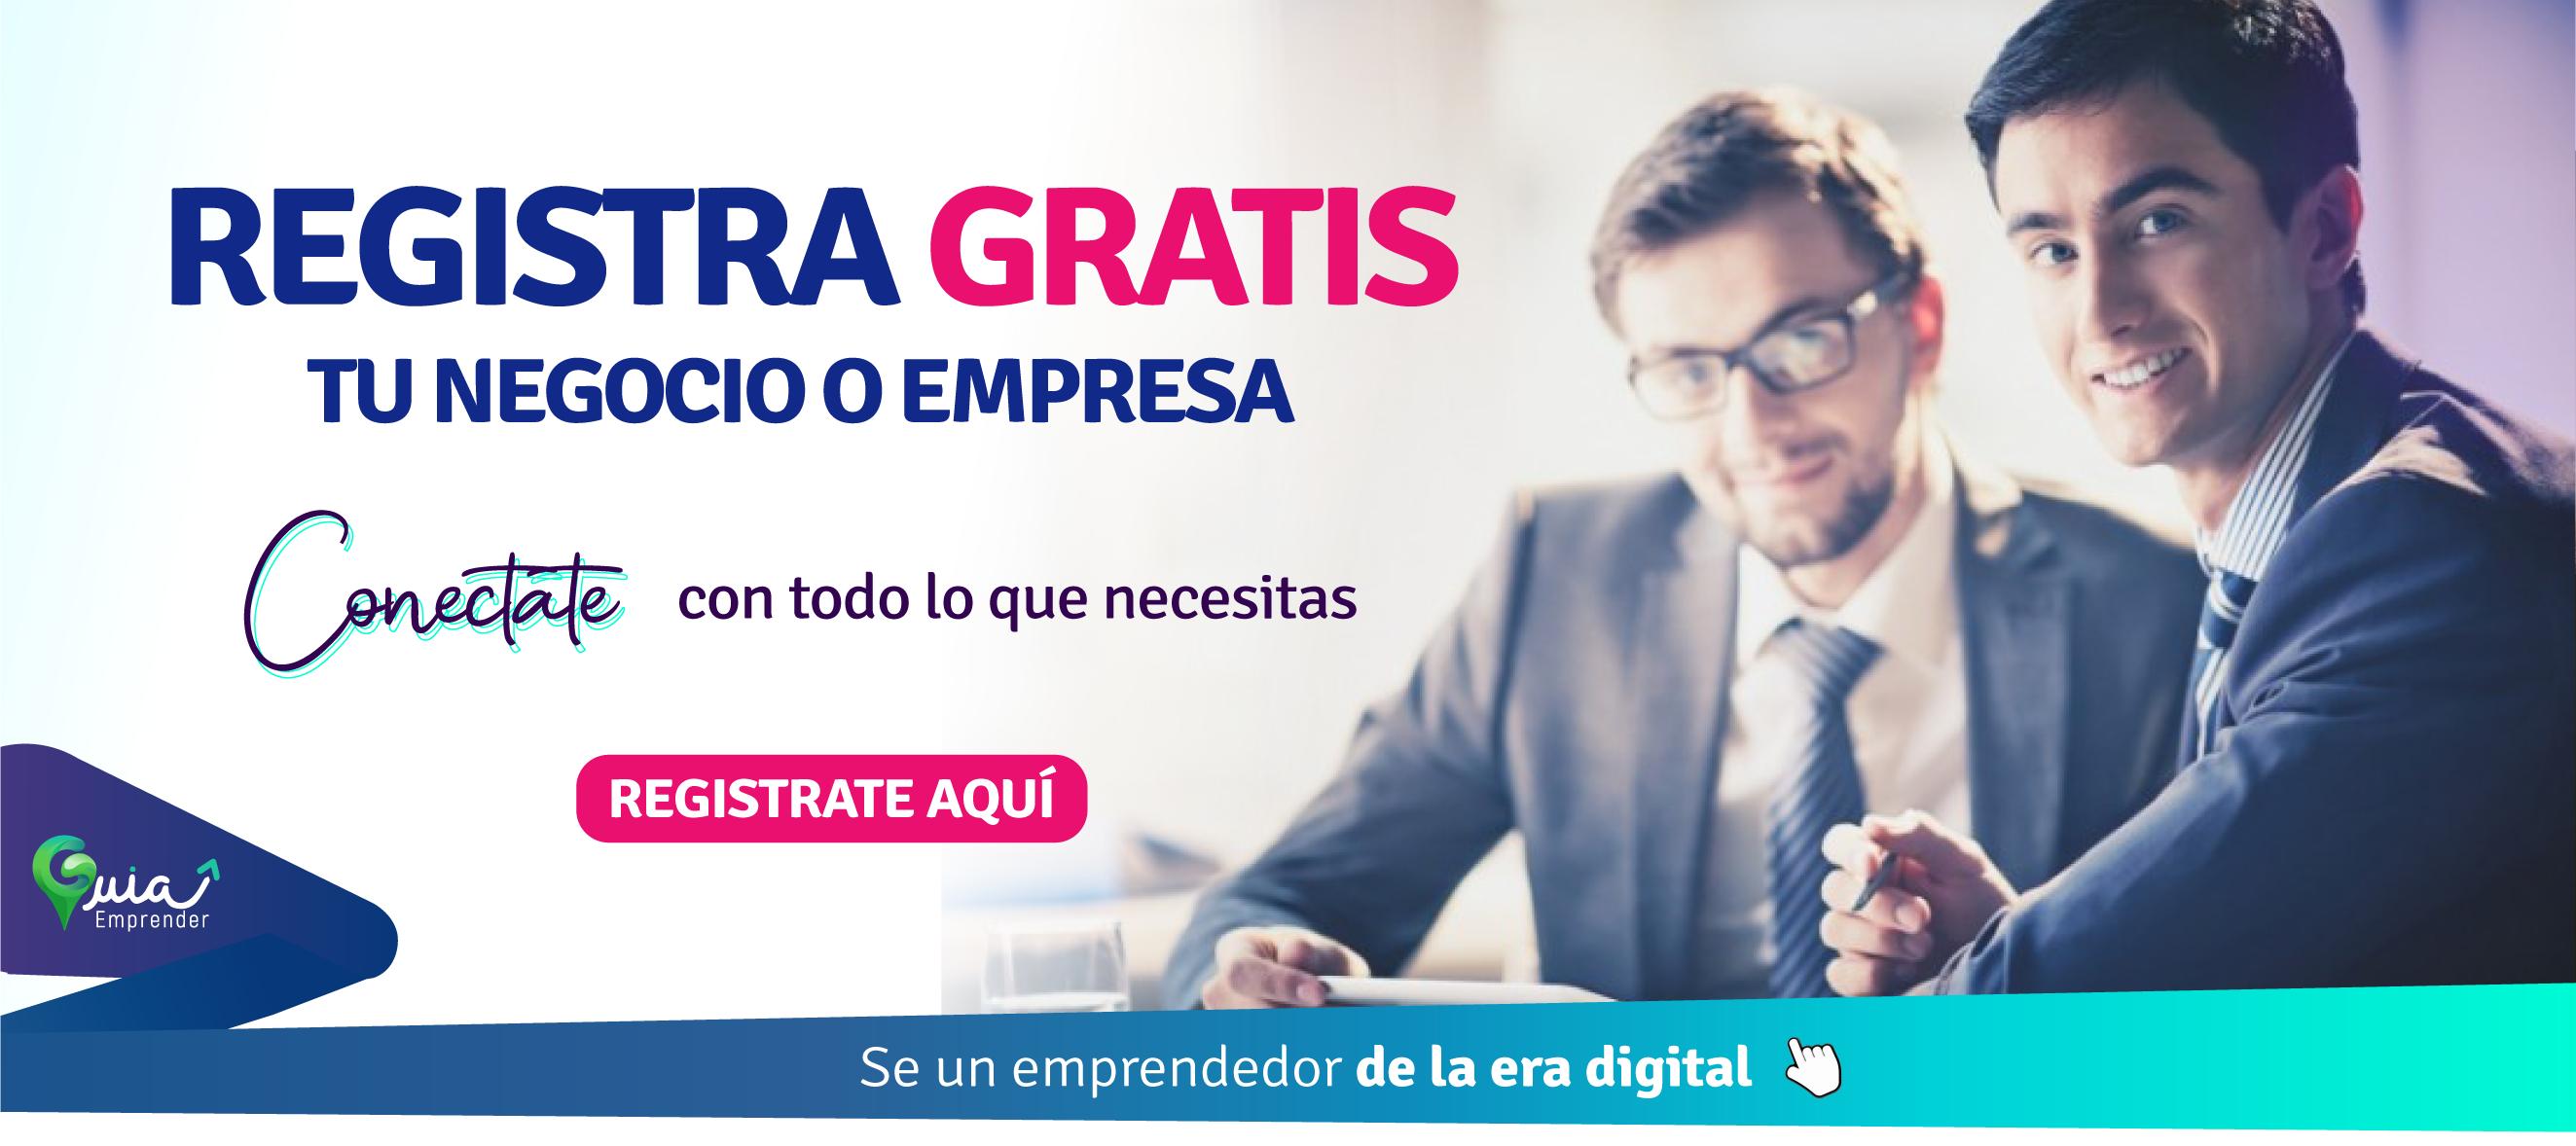 registra-gratis-tu-negocio-empresa-guia-emprender-emprendedor-era-digital-14